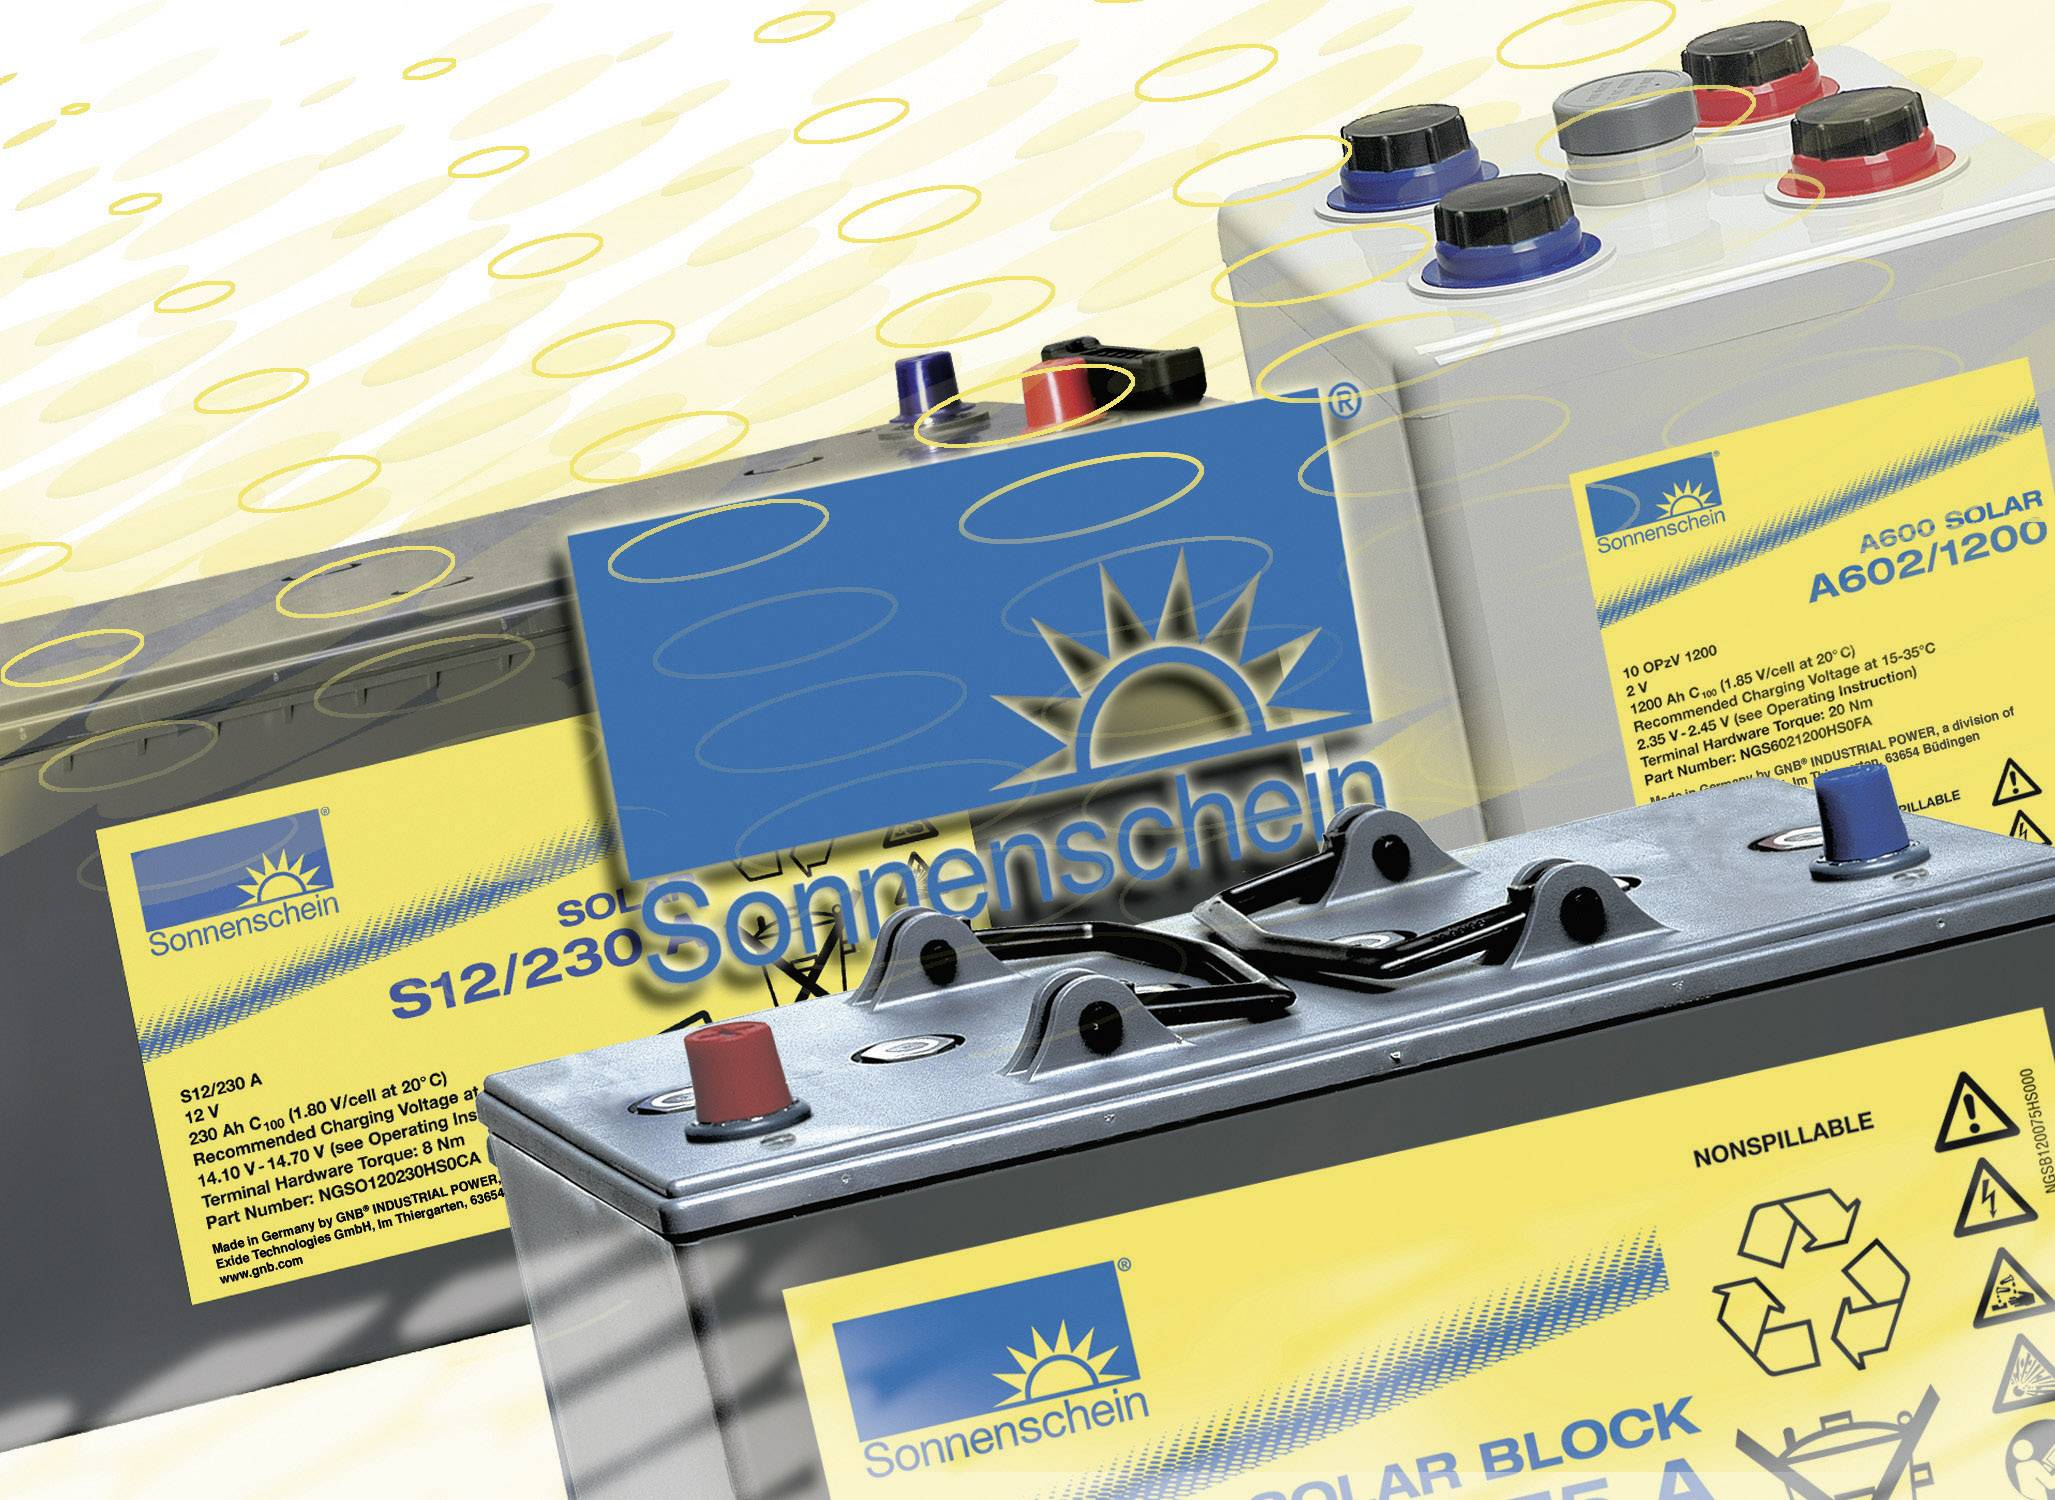 Solárny akumulátor GNB Sonnenschein dryfit S12/130 A 081 9875000, 12 V, 130 Ah